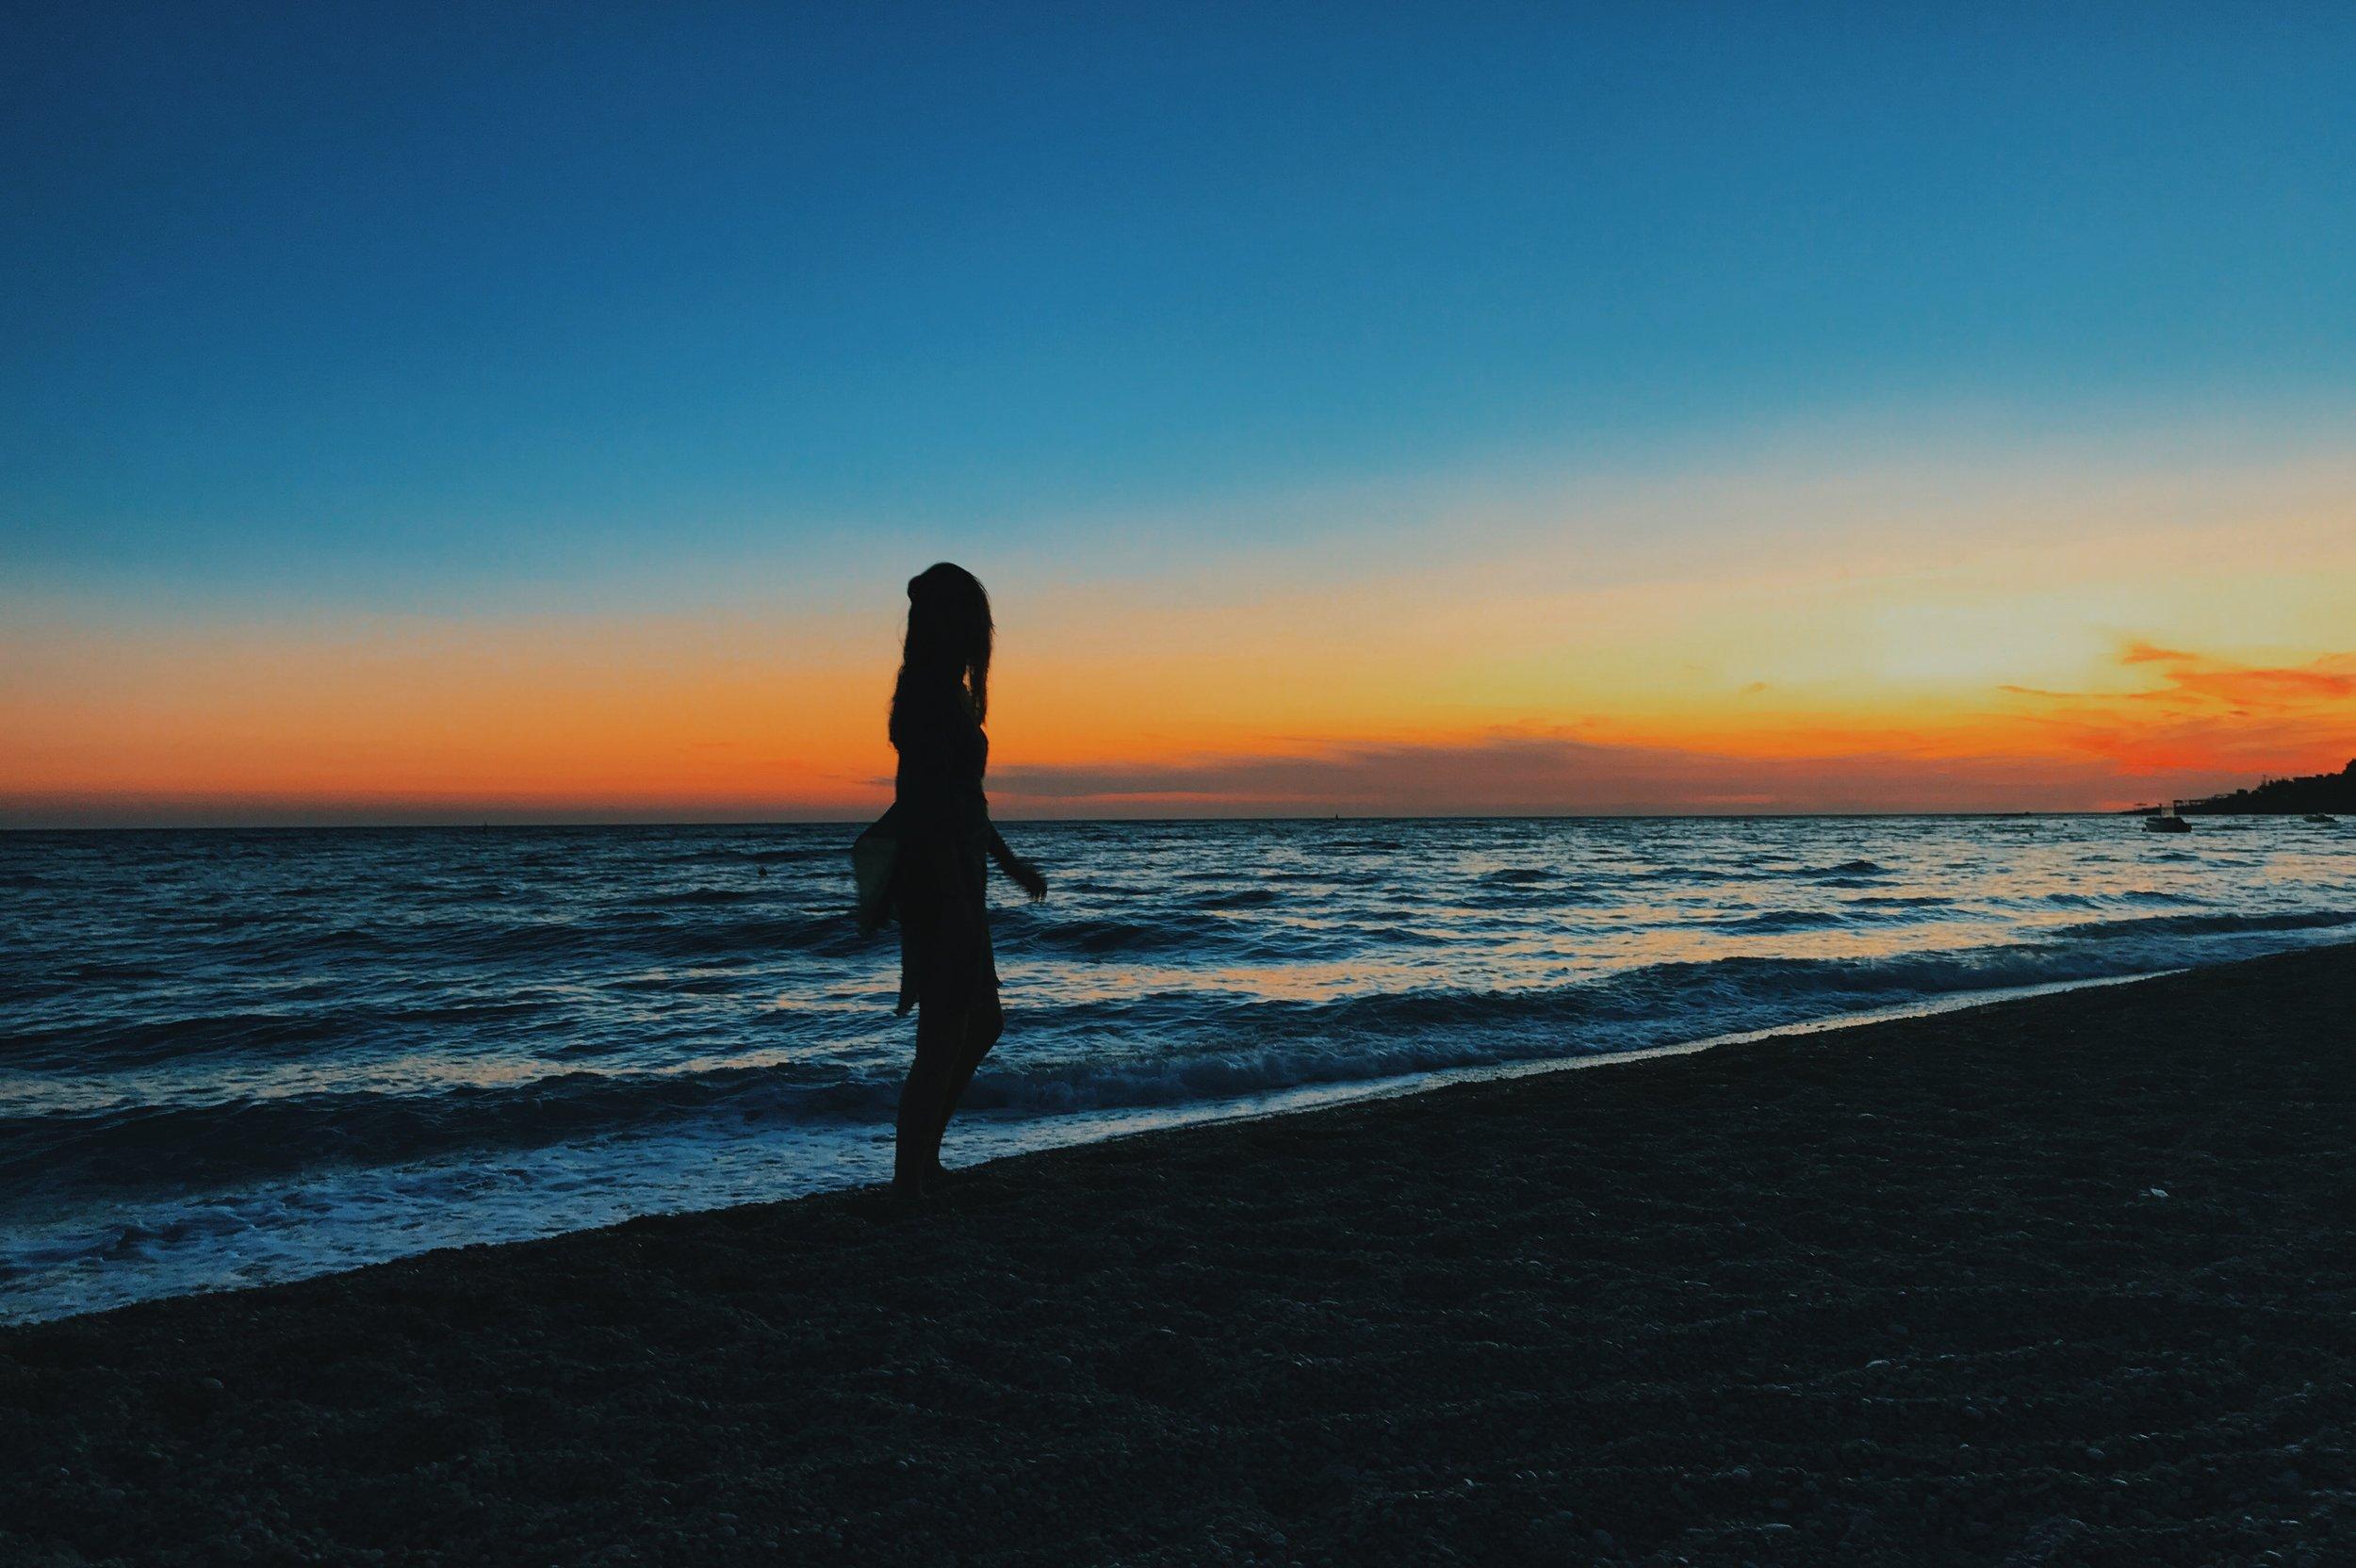 Sunset at Dhermi beach, Albania